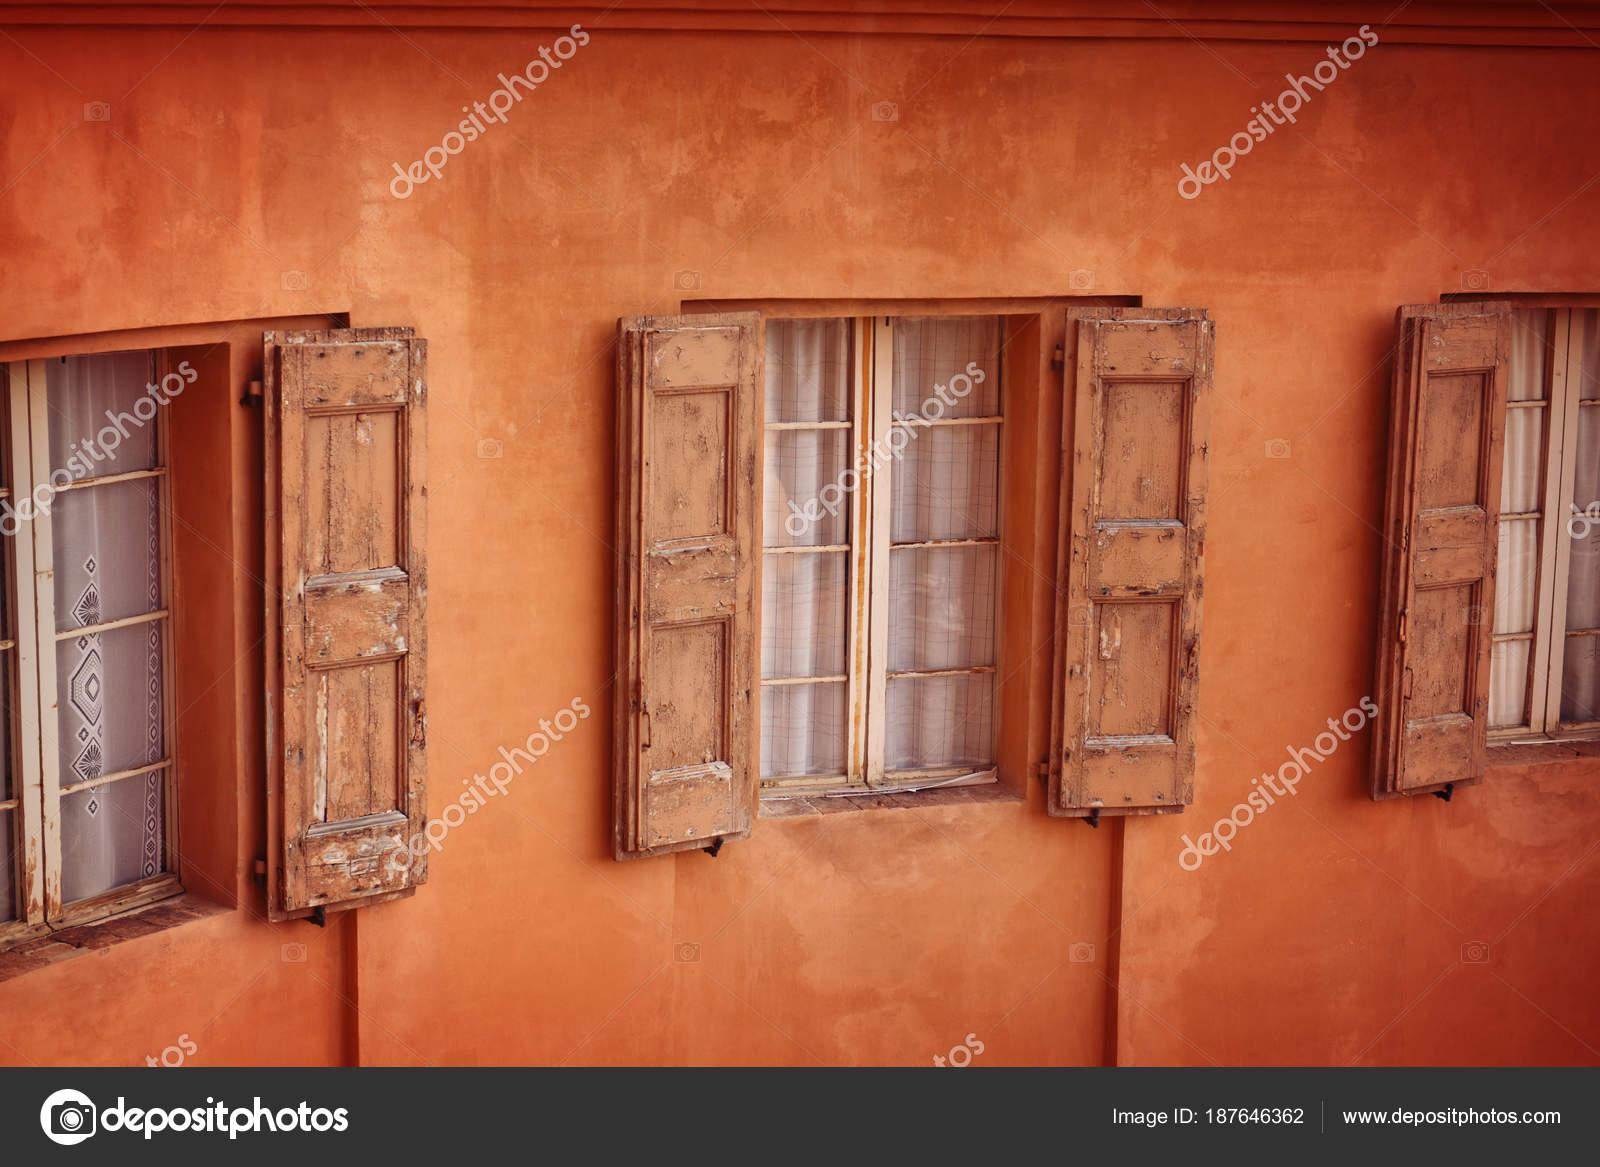 Fachada Casa Con Viejas Ventanas Con Postigos Madera Bolonia Italia ...